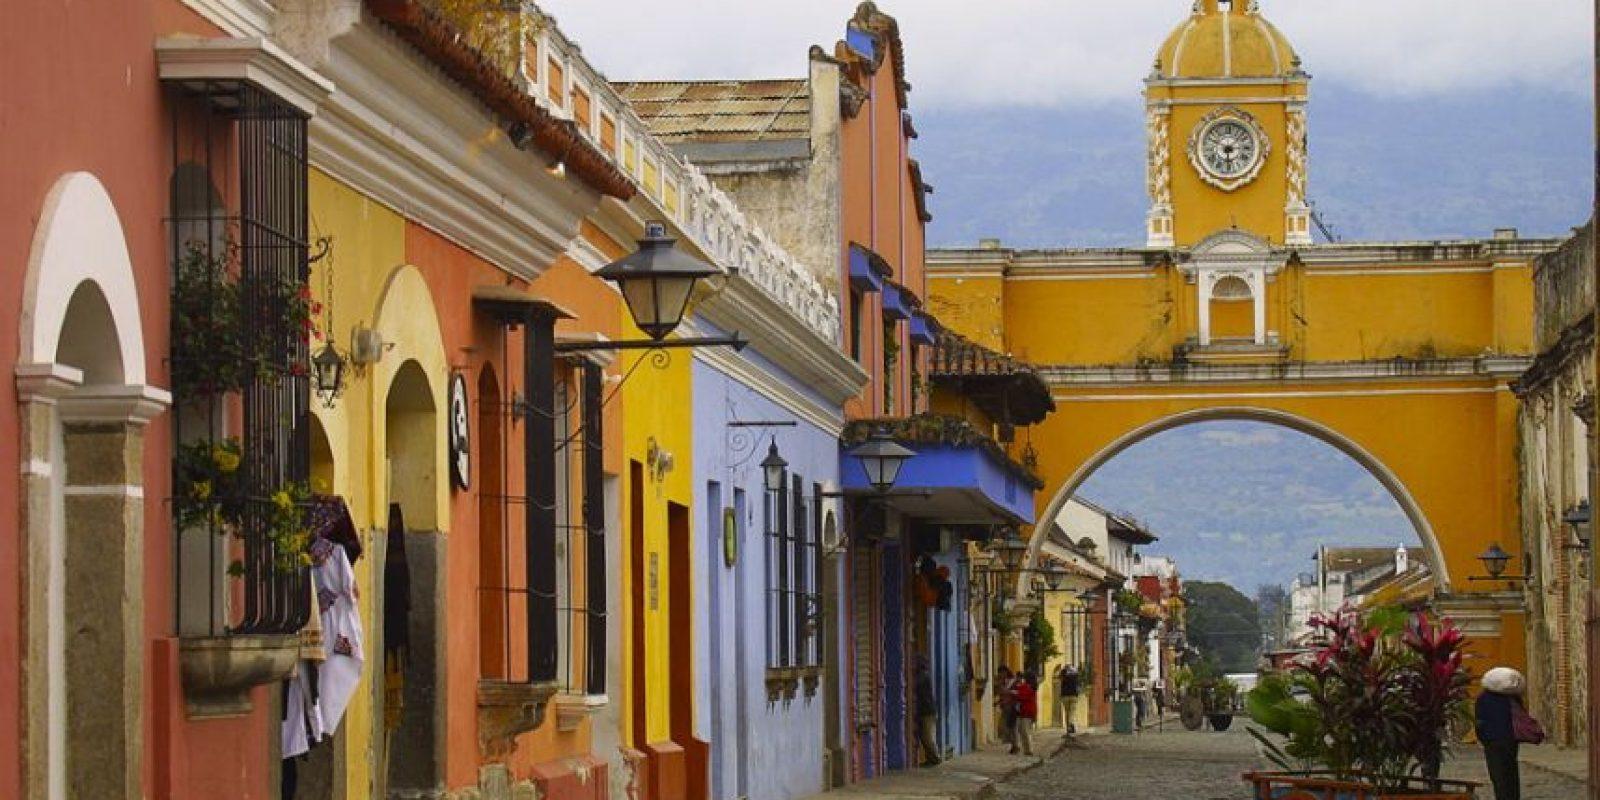 Si arquitectura no es histórica Foto:http://www.buzzfeed.com/